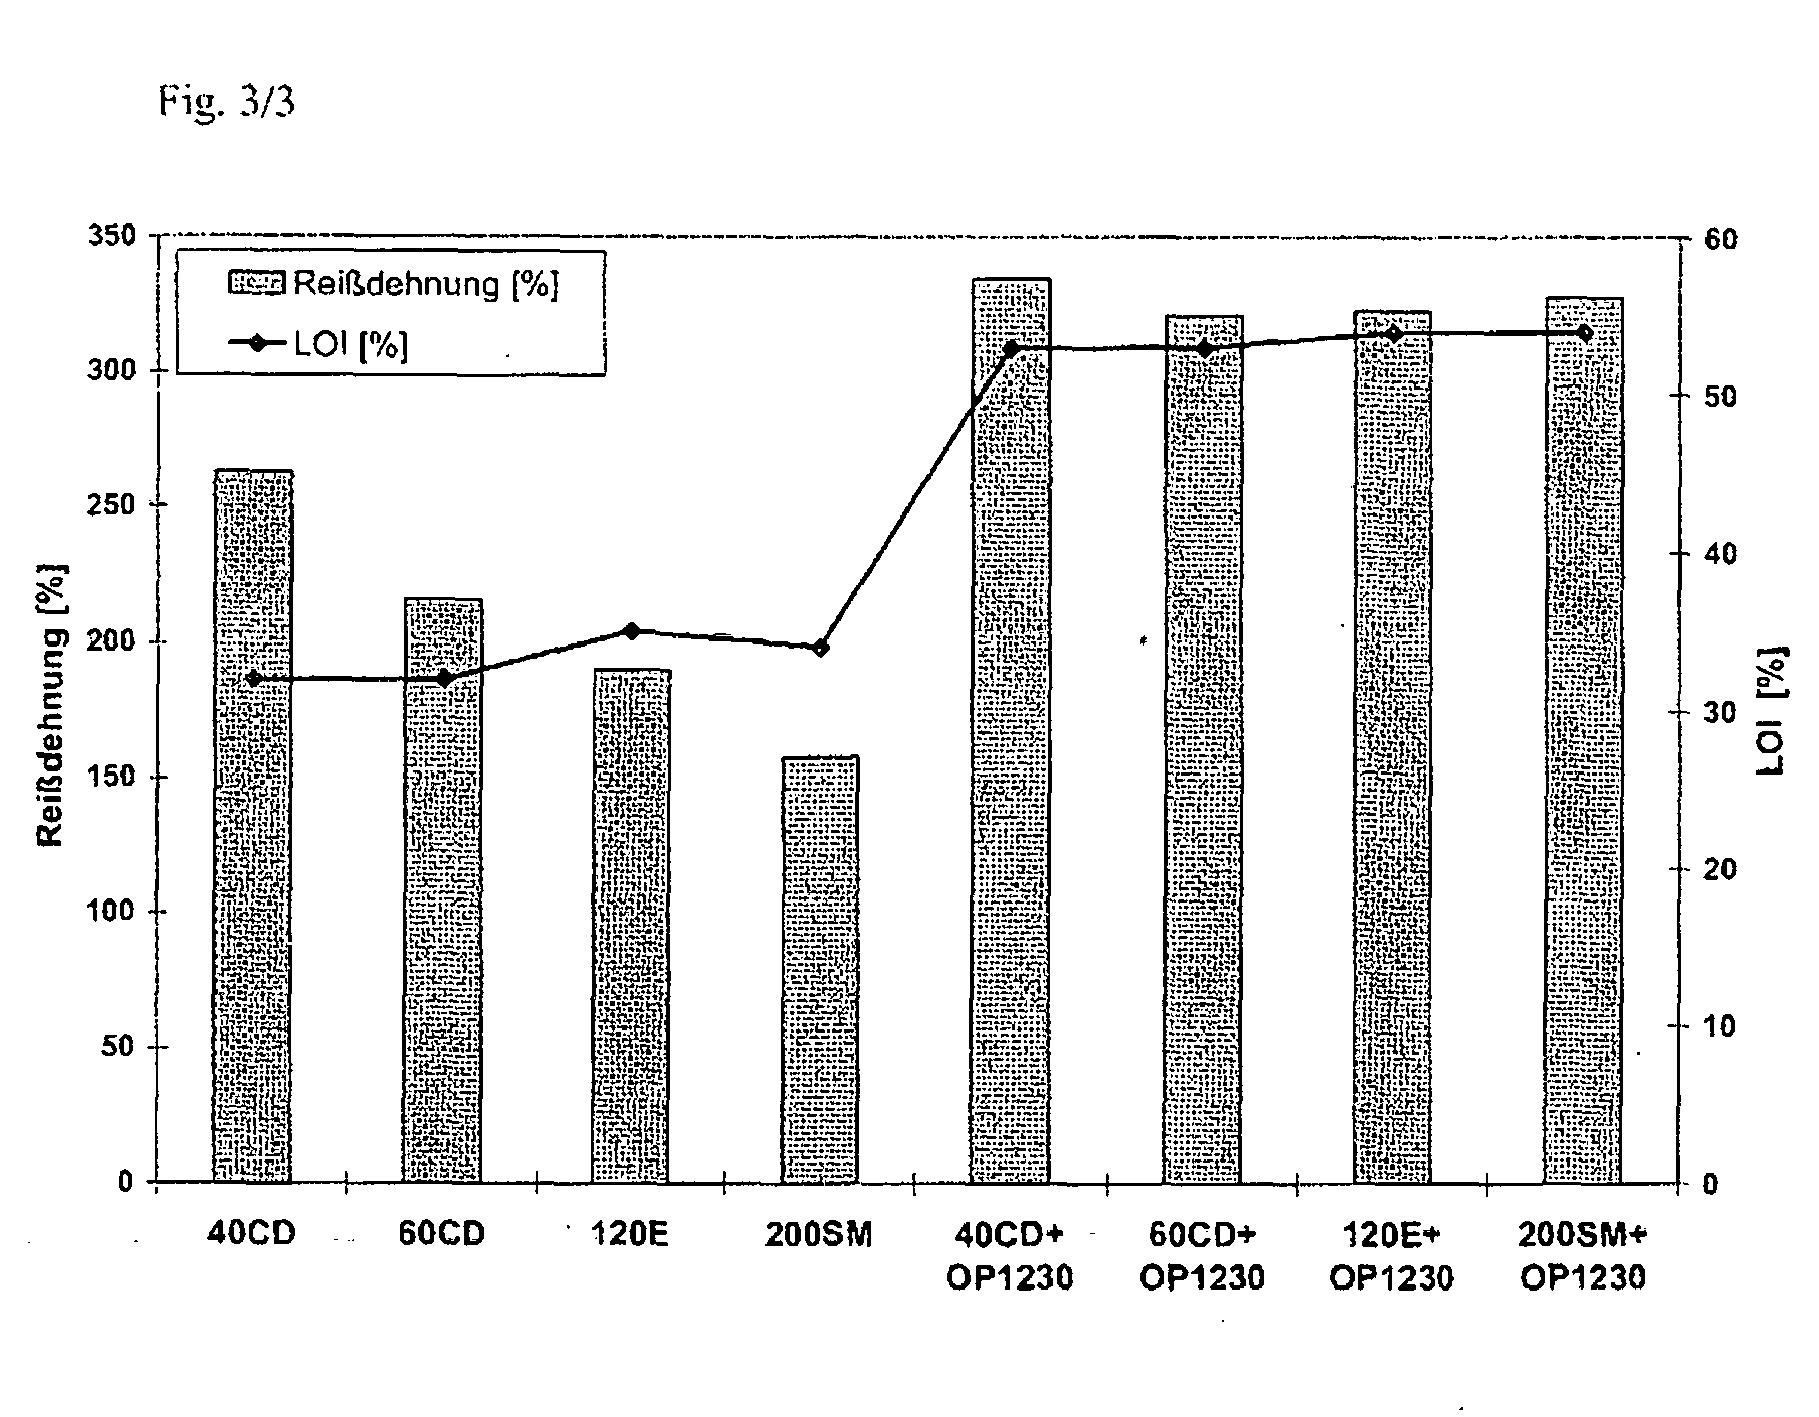 Großzügig Kabelisolationstypen Tabelle Galerie - Elektrische ...